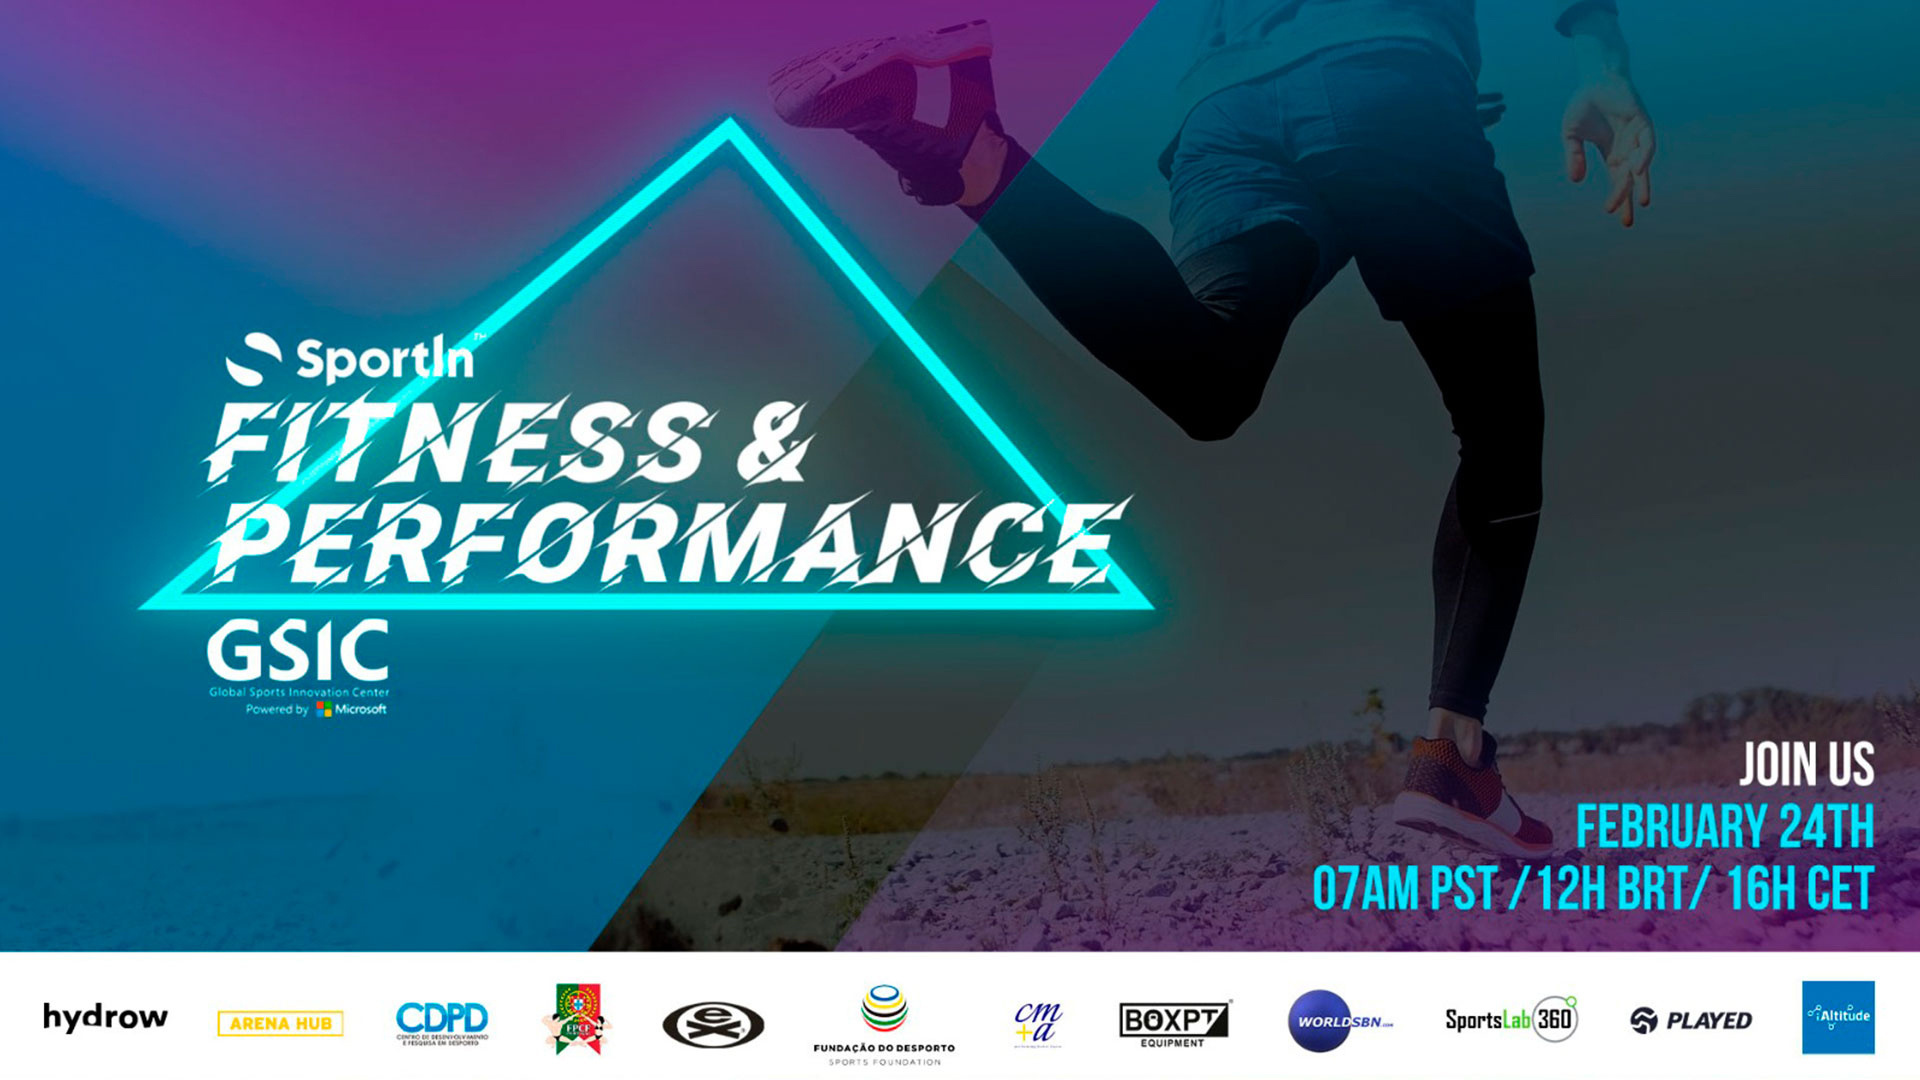 Conferência SportIn Global Summit: Fitness & Performance a 24 de fevereiro